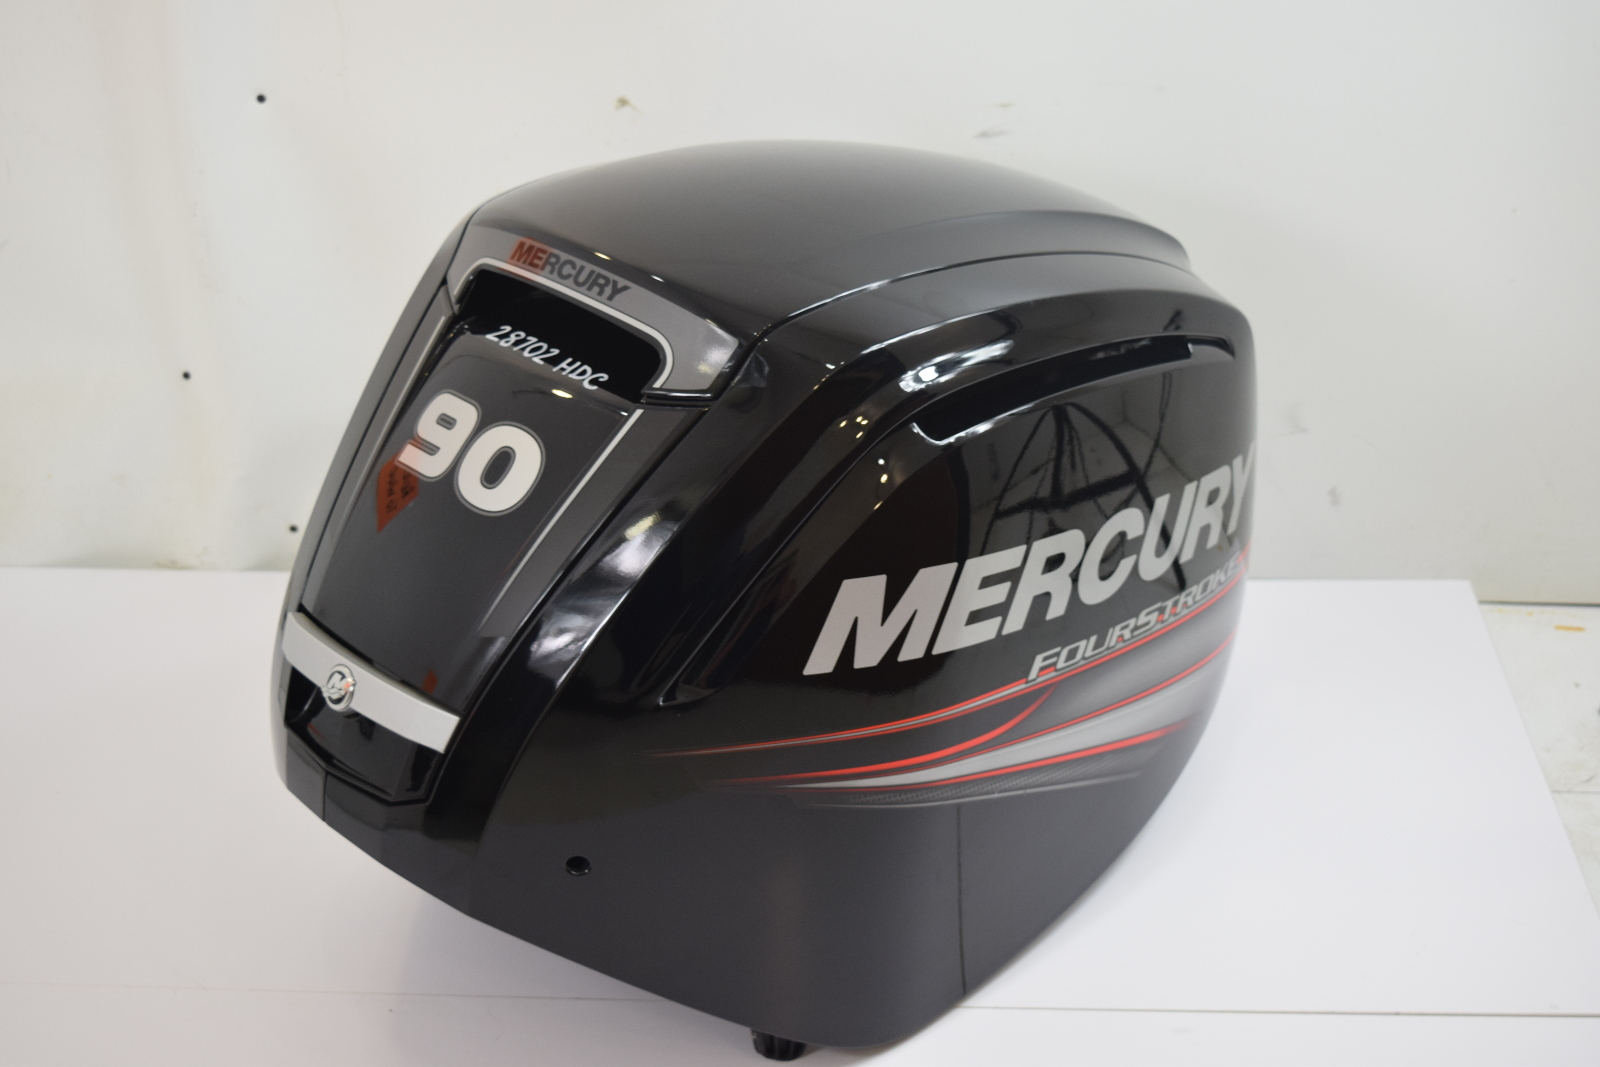 90 Hp Mercury Outboard >> LIKE NEW! 2015 Mercury Hood Engine Cover Cowling 8M0087994 ...